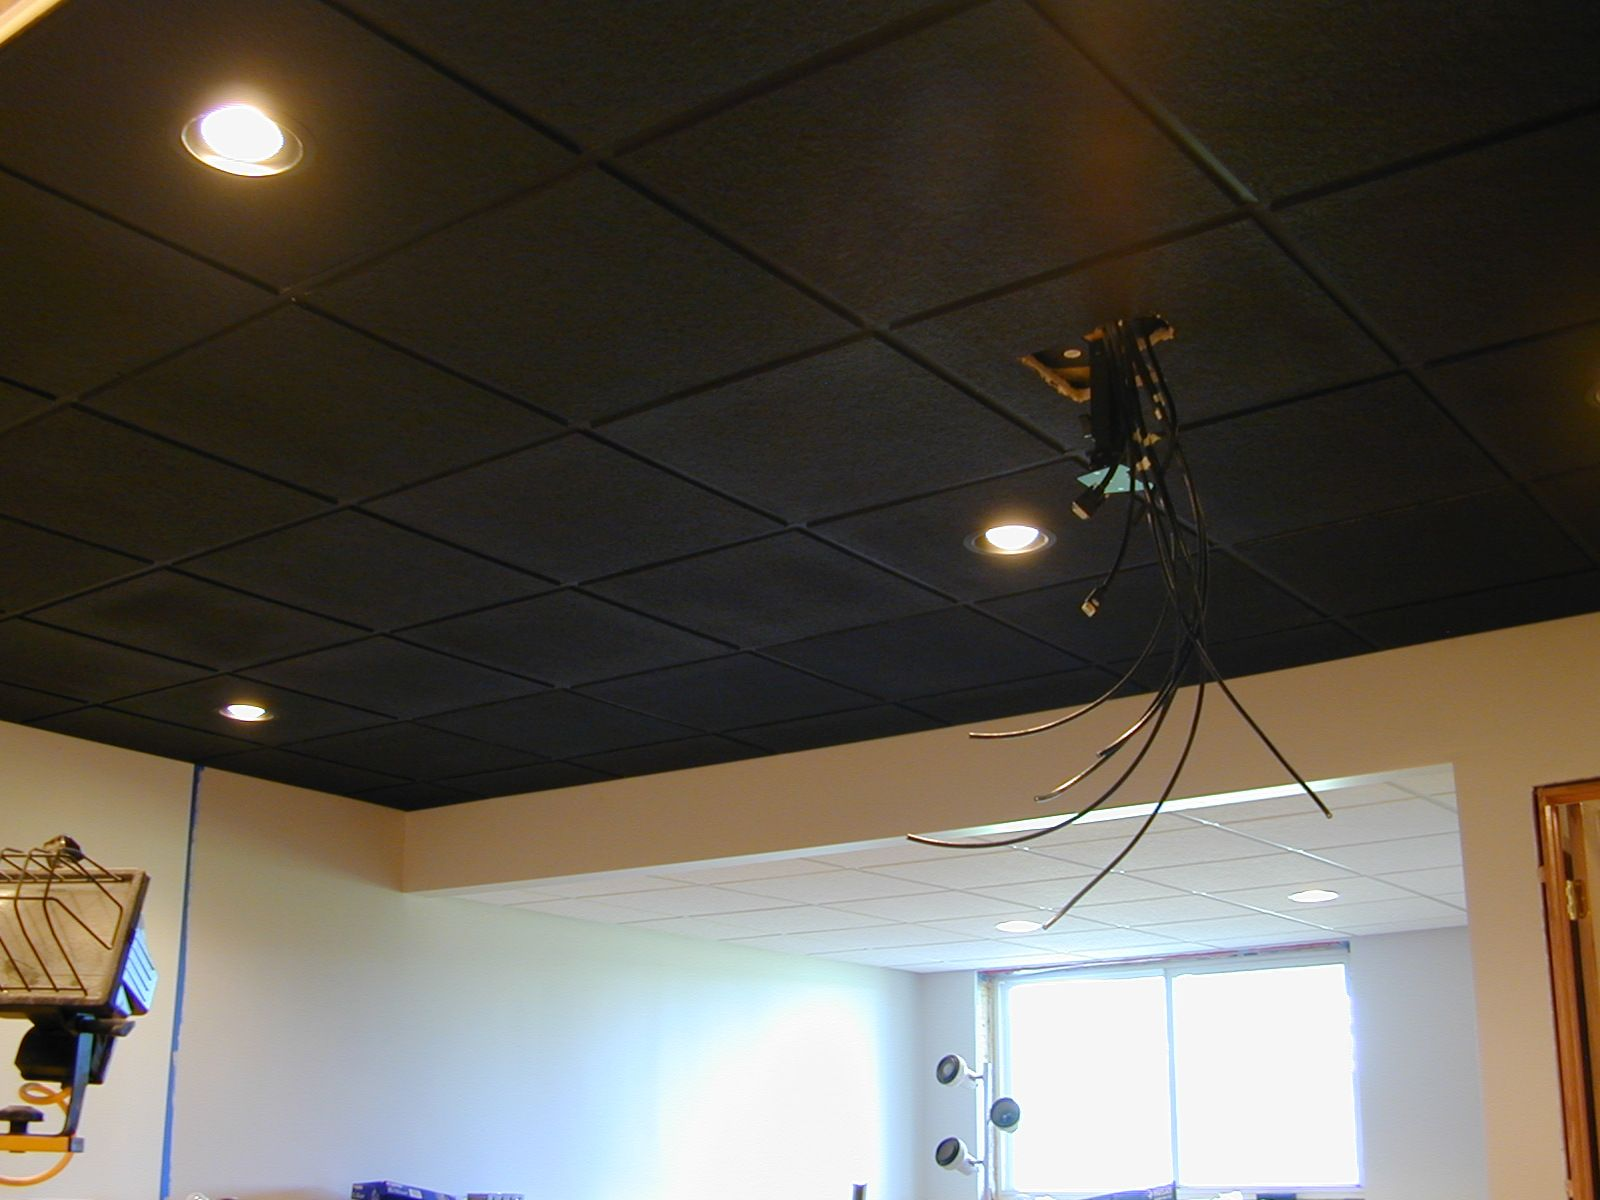 Spray Paint Basement Ceiling Ideas Black Ceiling Tiles Dropped Ceiling Ceiling Tiles